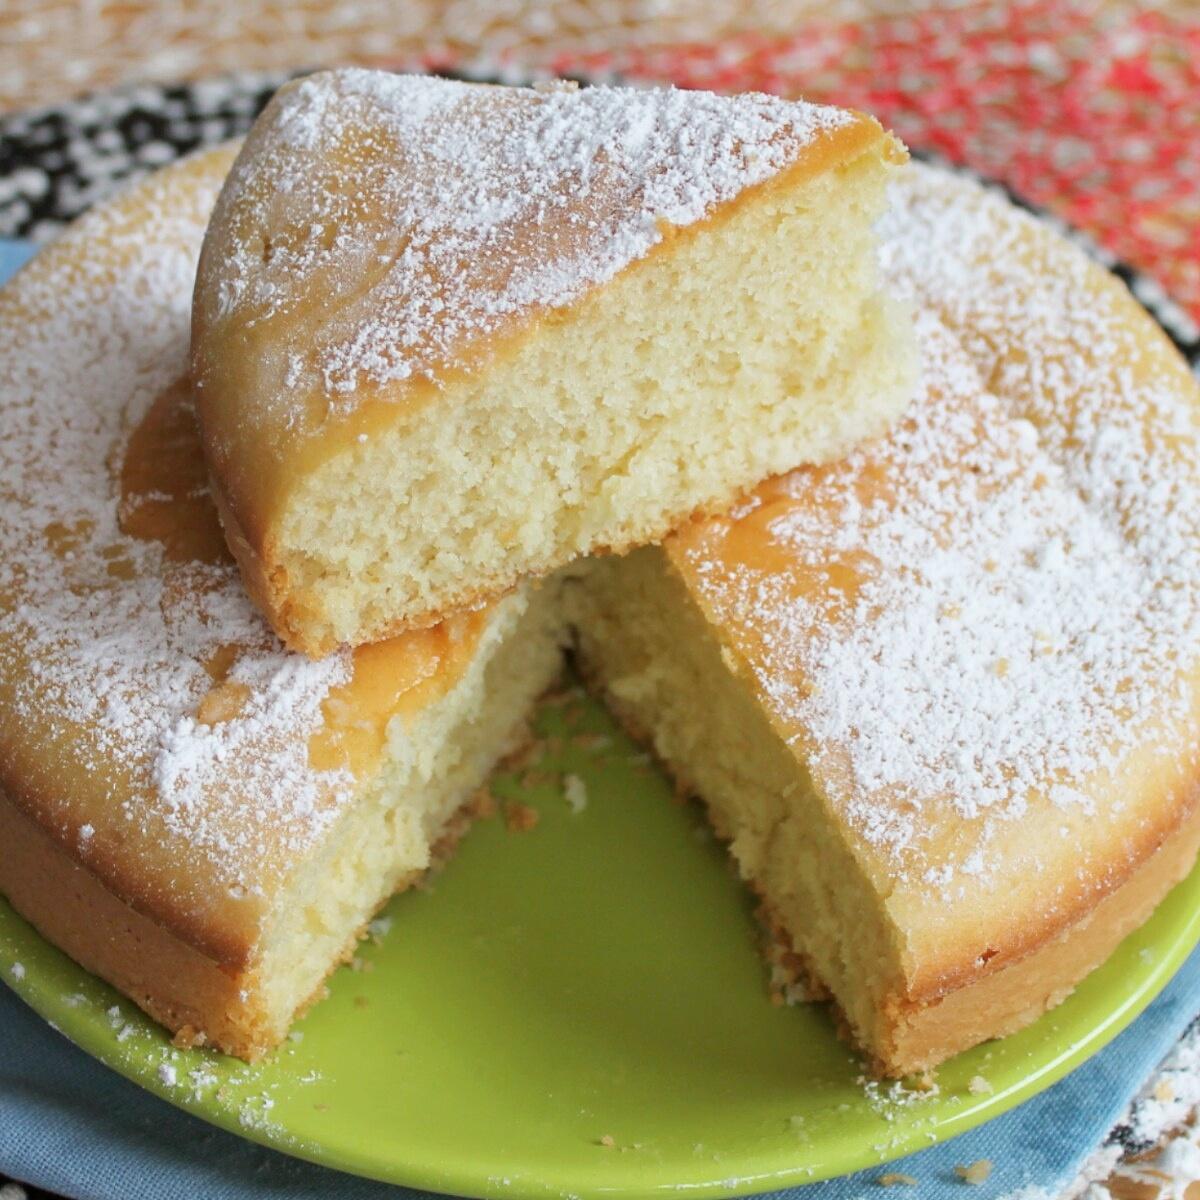 Ricetta Torta Senza Burro.Dolci Senza Burro 80 Ricette Torte Plumcake Ciambelle Crostate